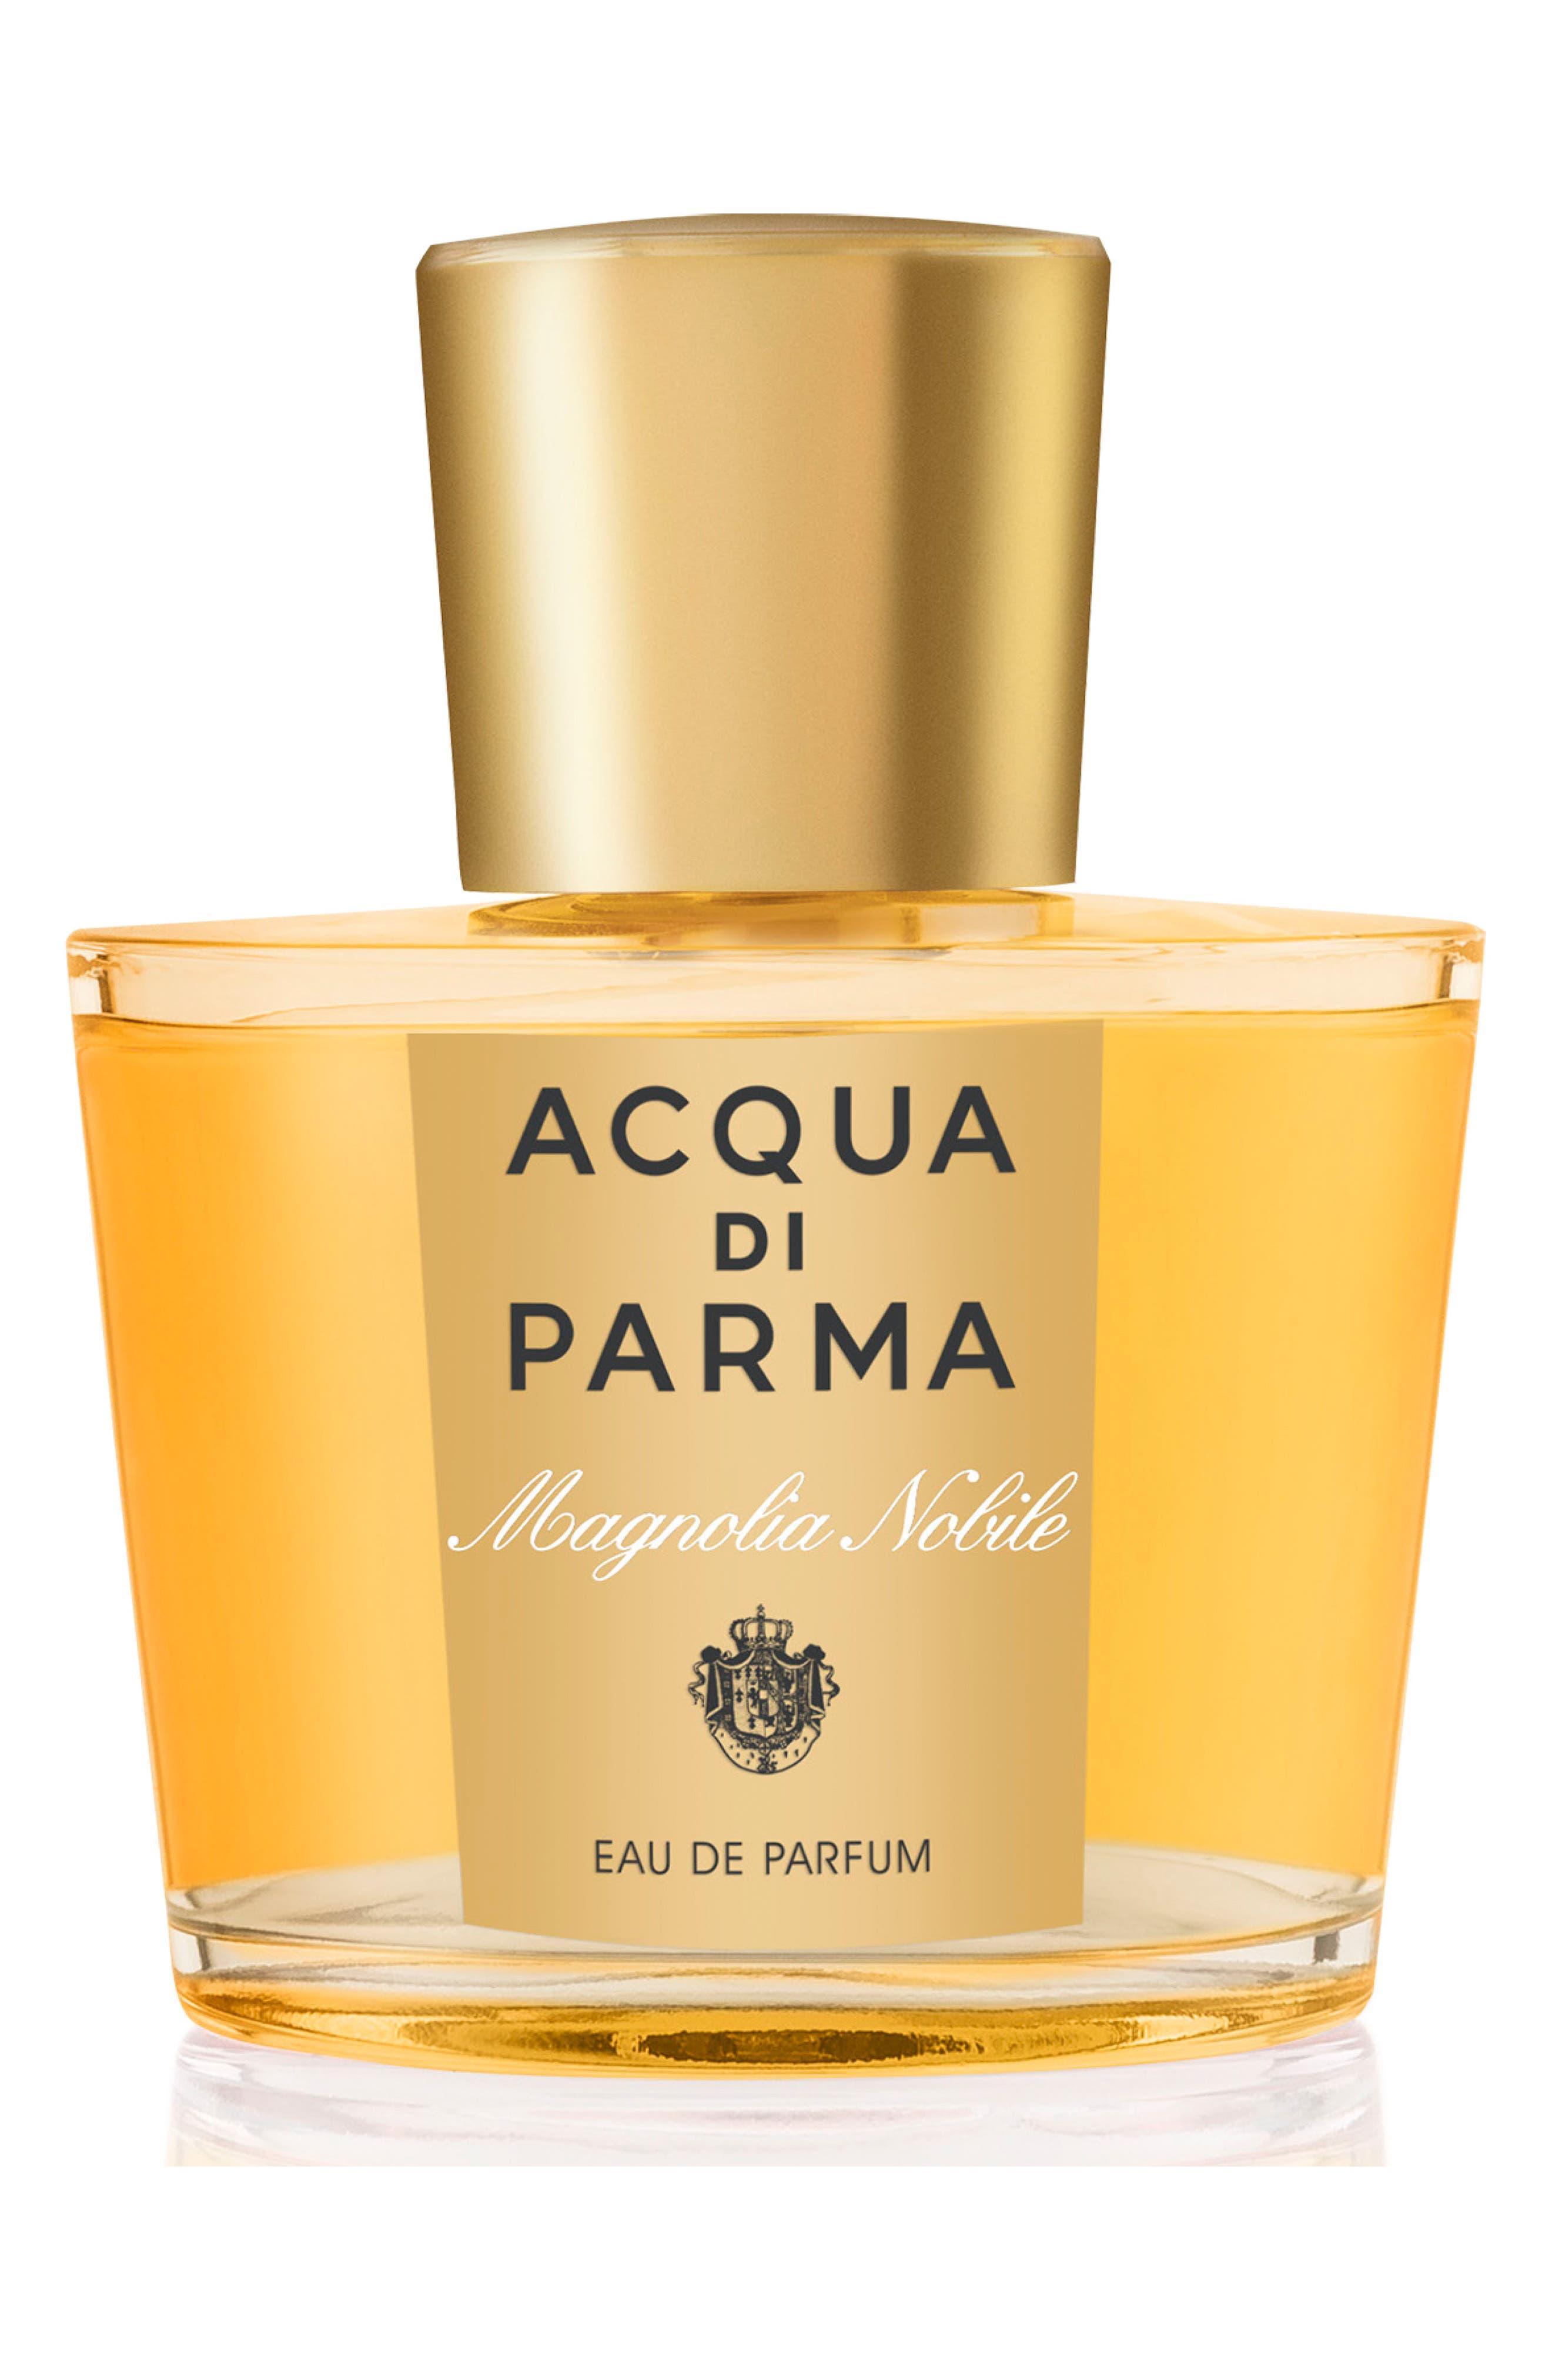 ACQUA DI PARMA 'Magnolia Nobile' Eau de Parfum, Main, color, NO COLOR